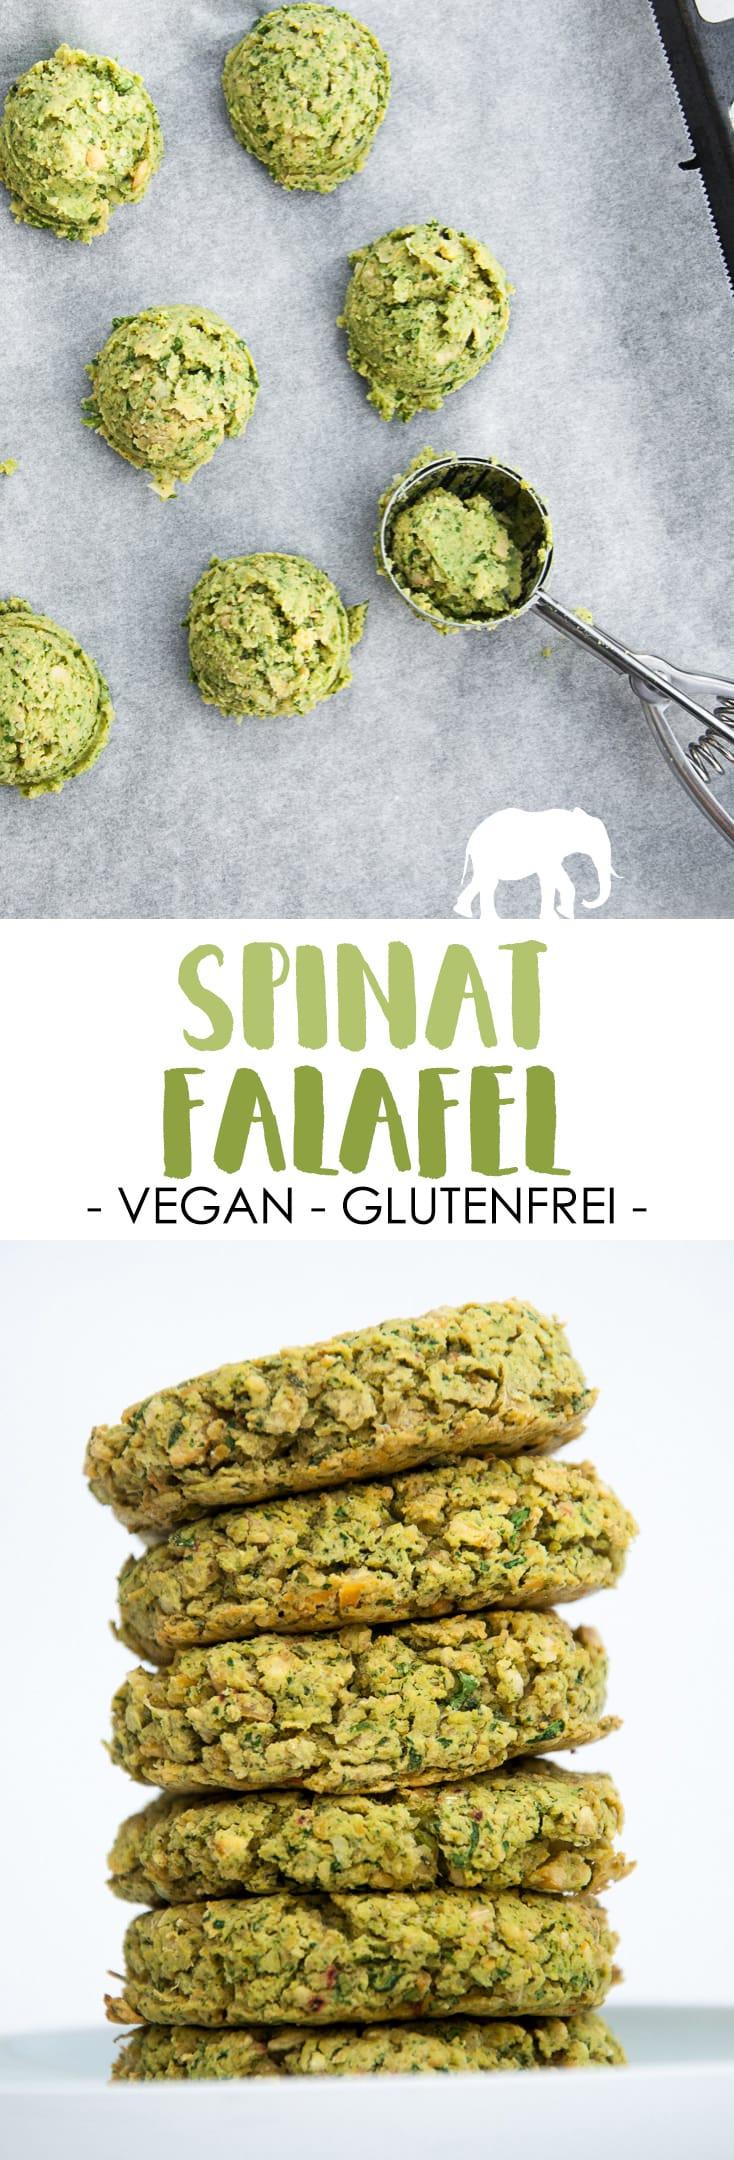 Spinat-Falafel #vegan #glutenfrei | ElephantasticVegan.de